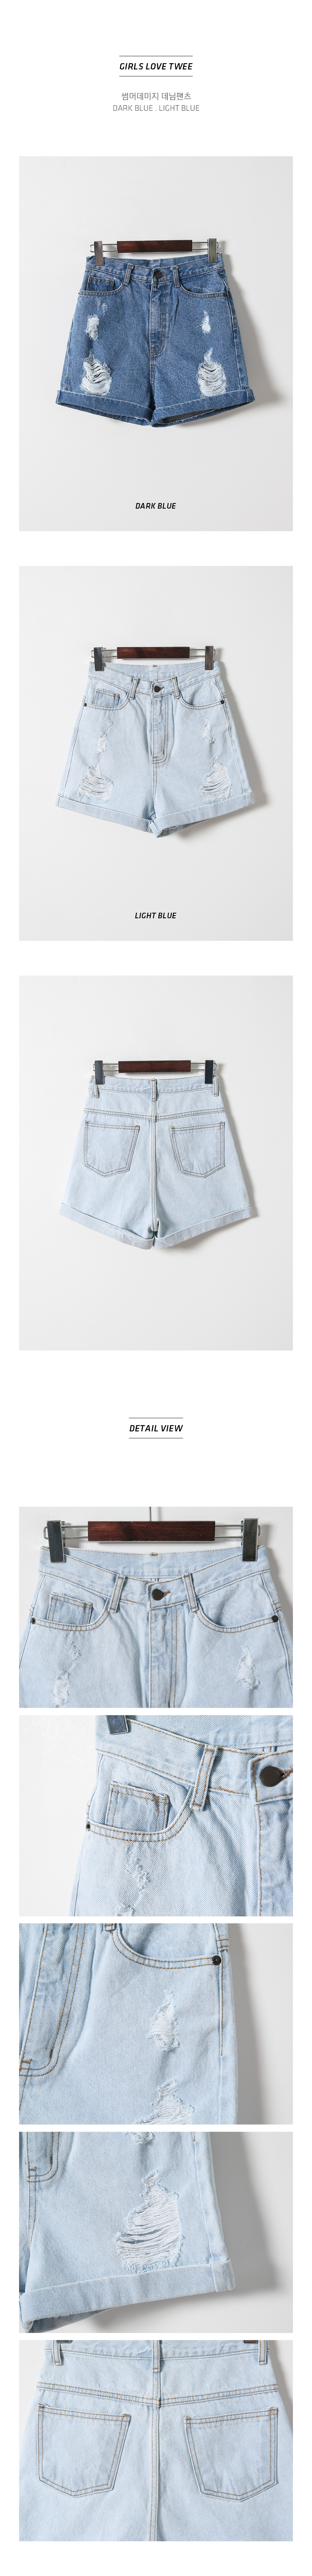 Summer Damage Denim Pants